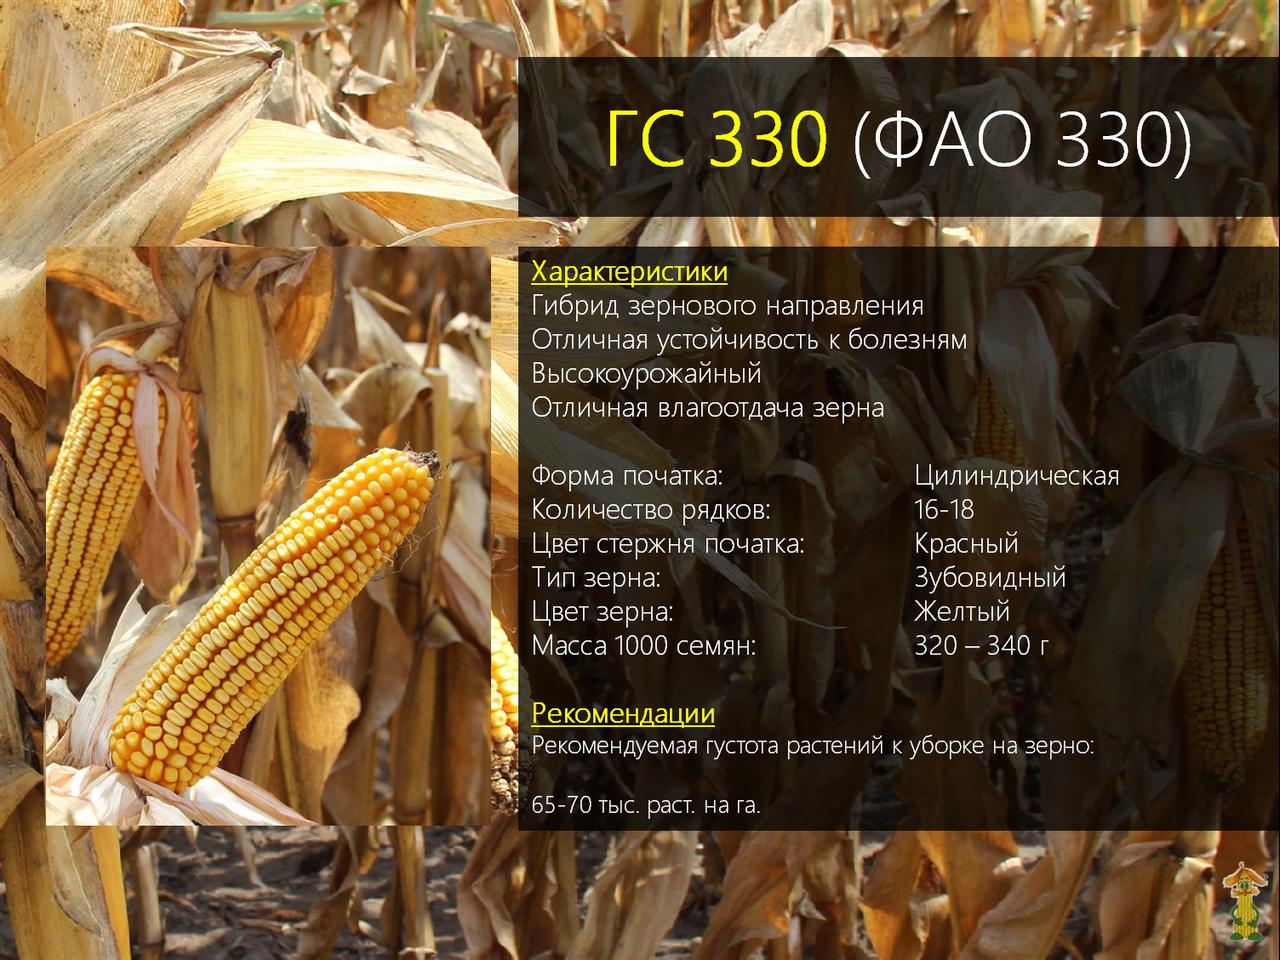 Гибрид кукурузы ГС 330 - ФАО 330 (2019)